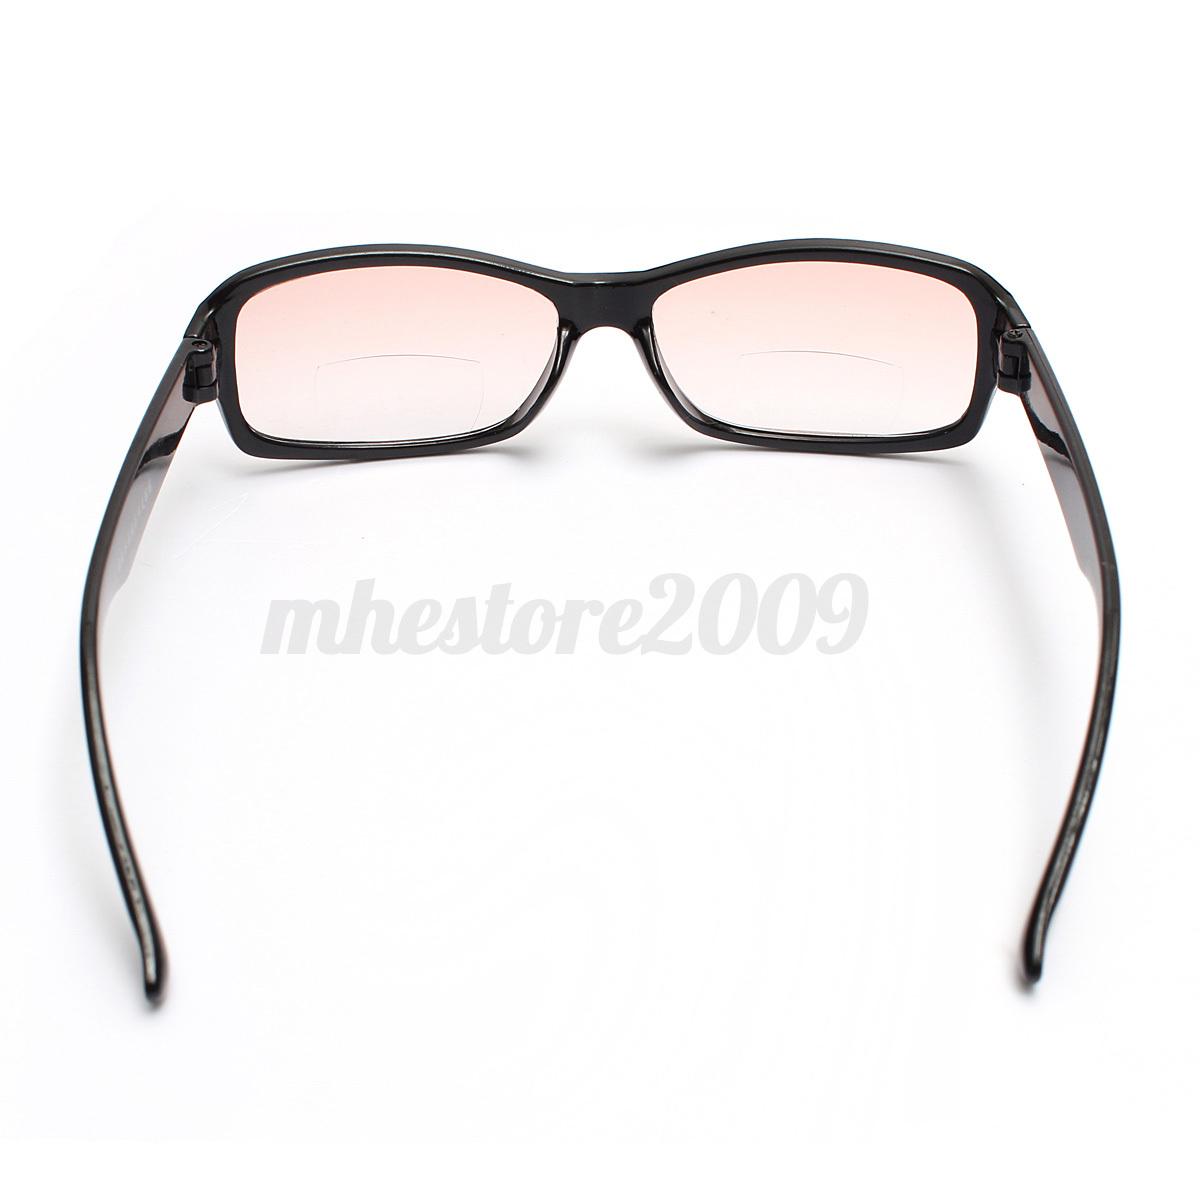 unisex lightweight dual function bifocal reading glasses